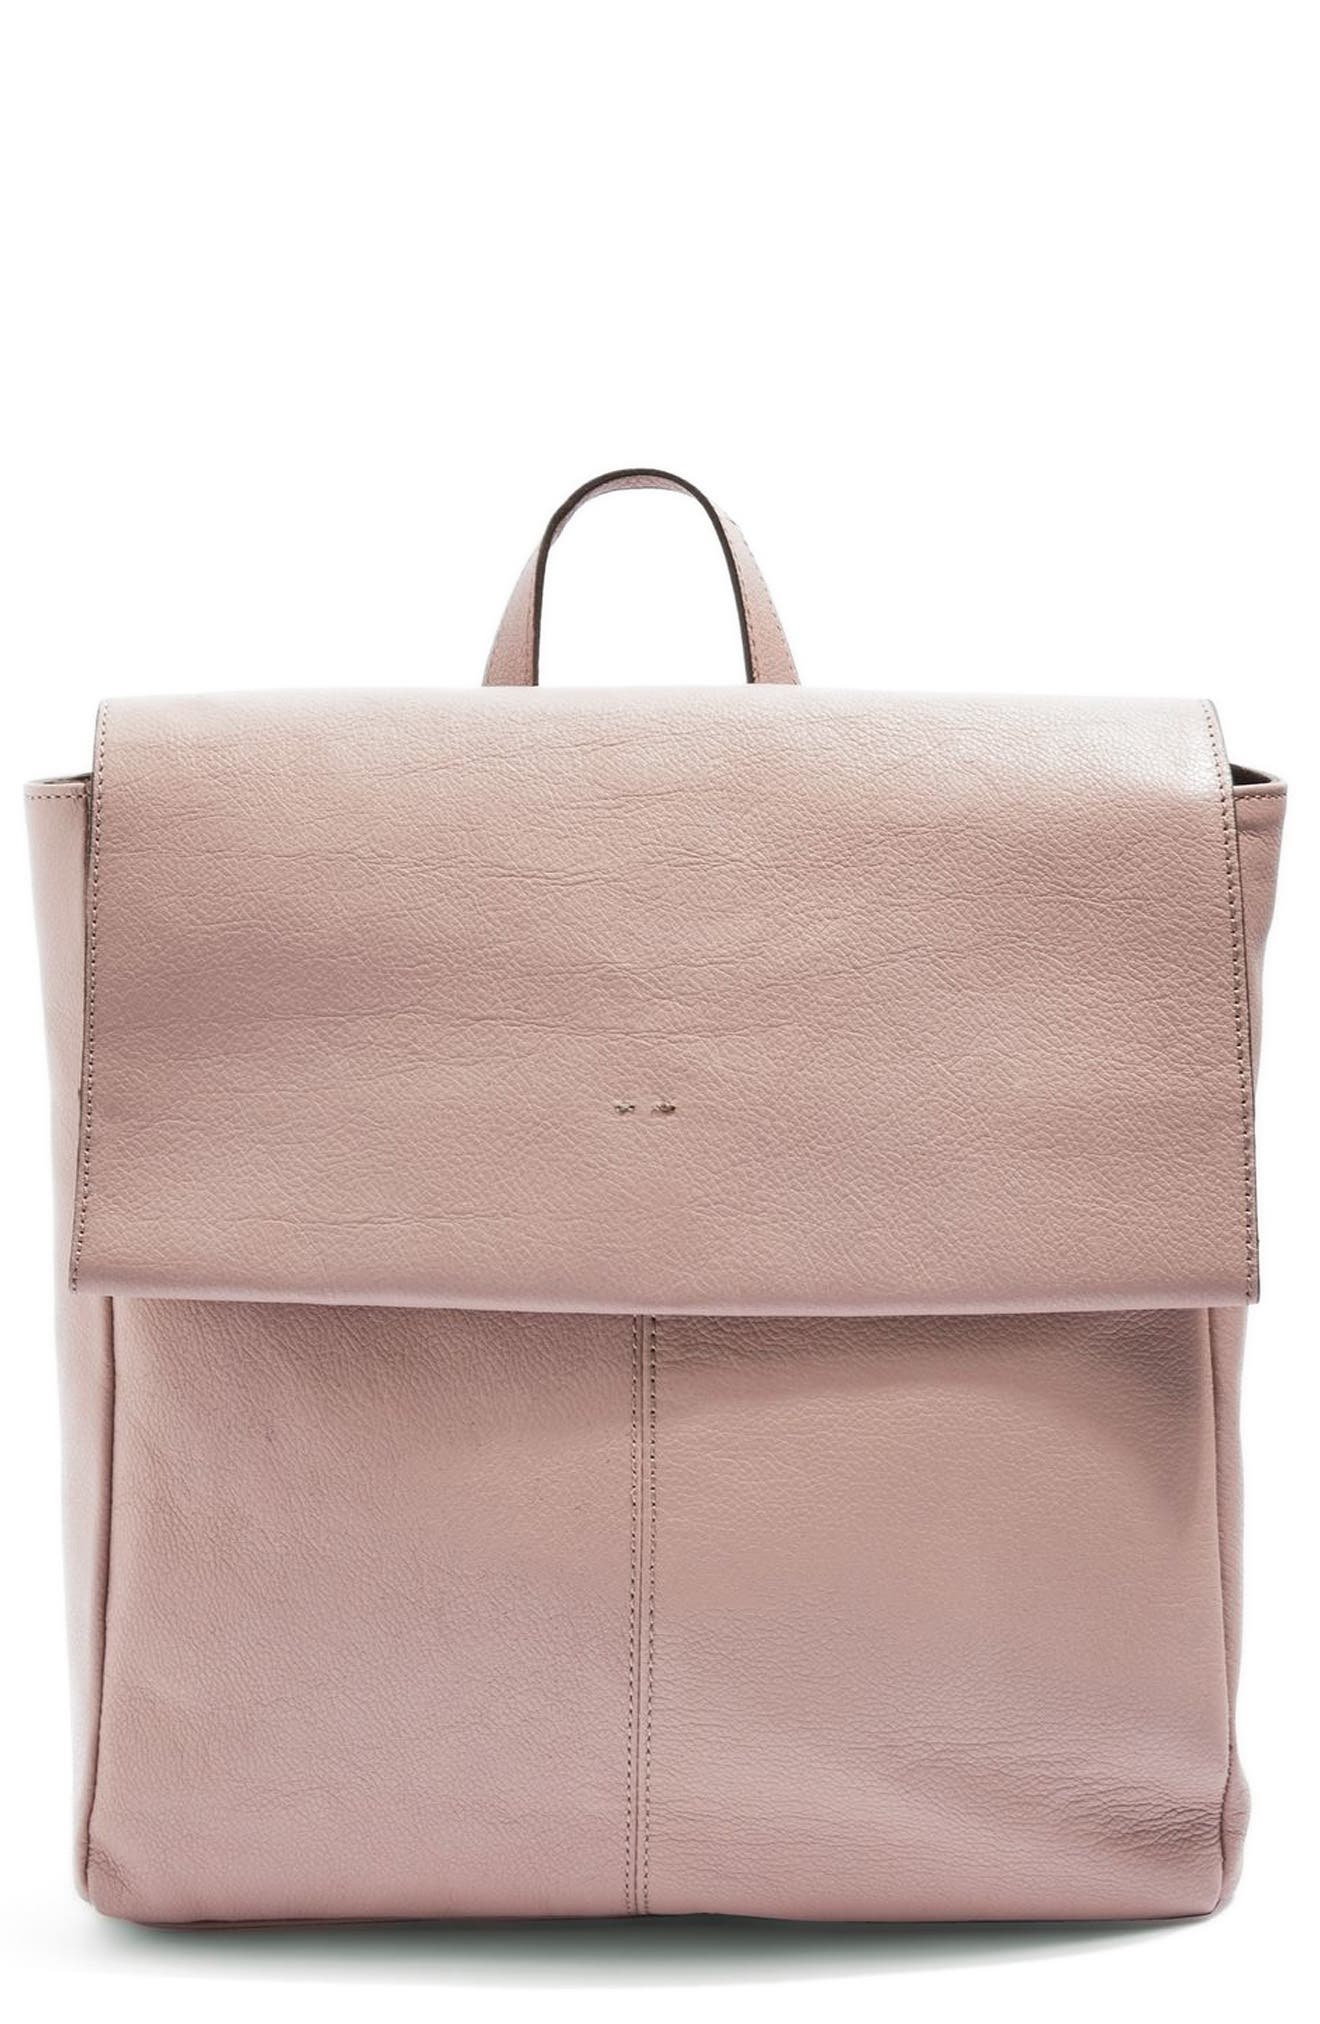 TOPSHOP Calfskin Leather Backpack